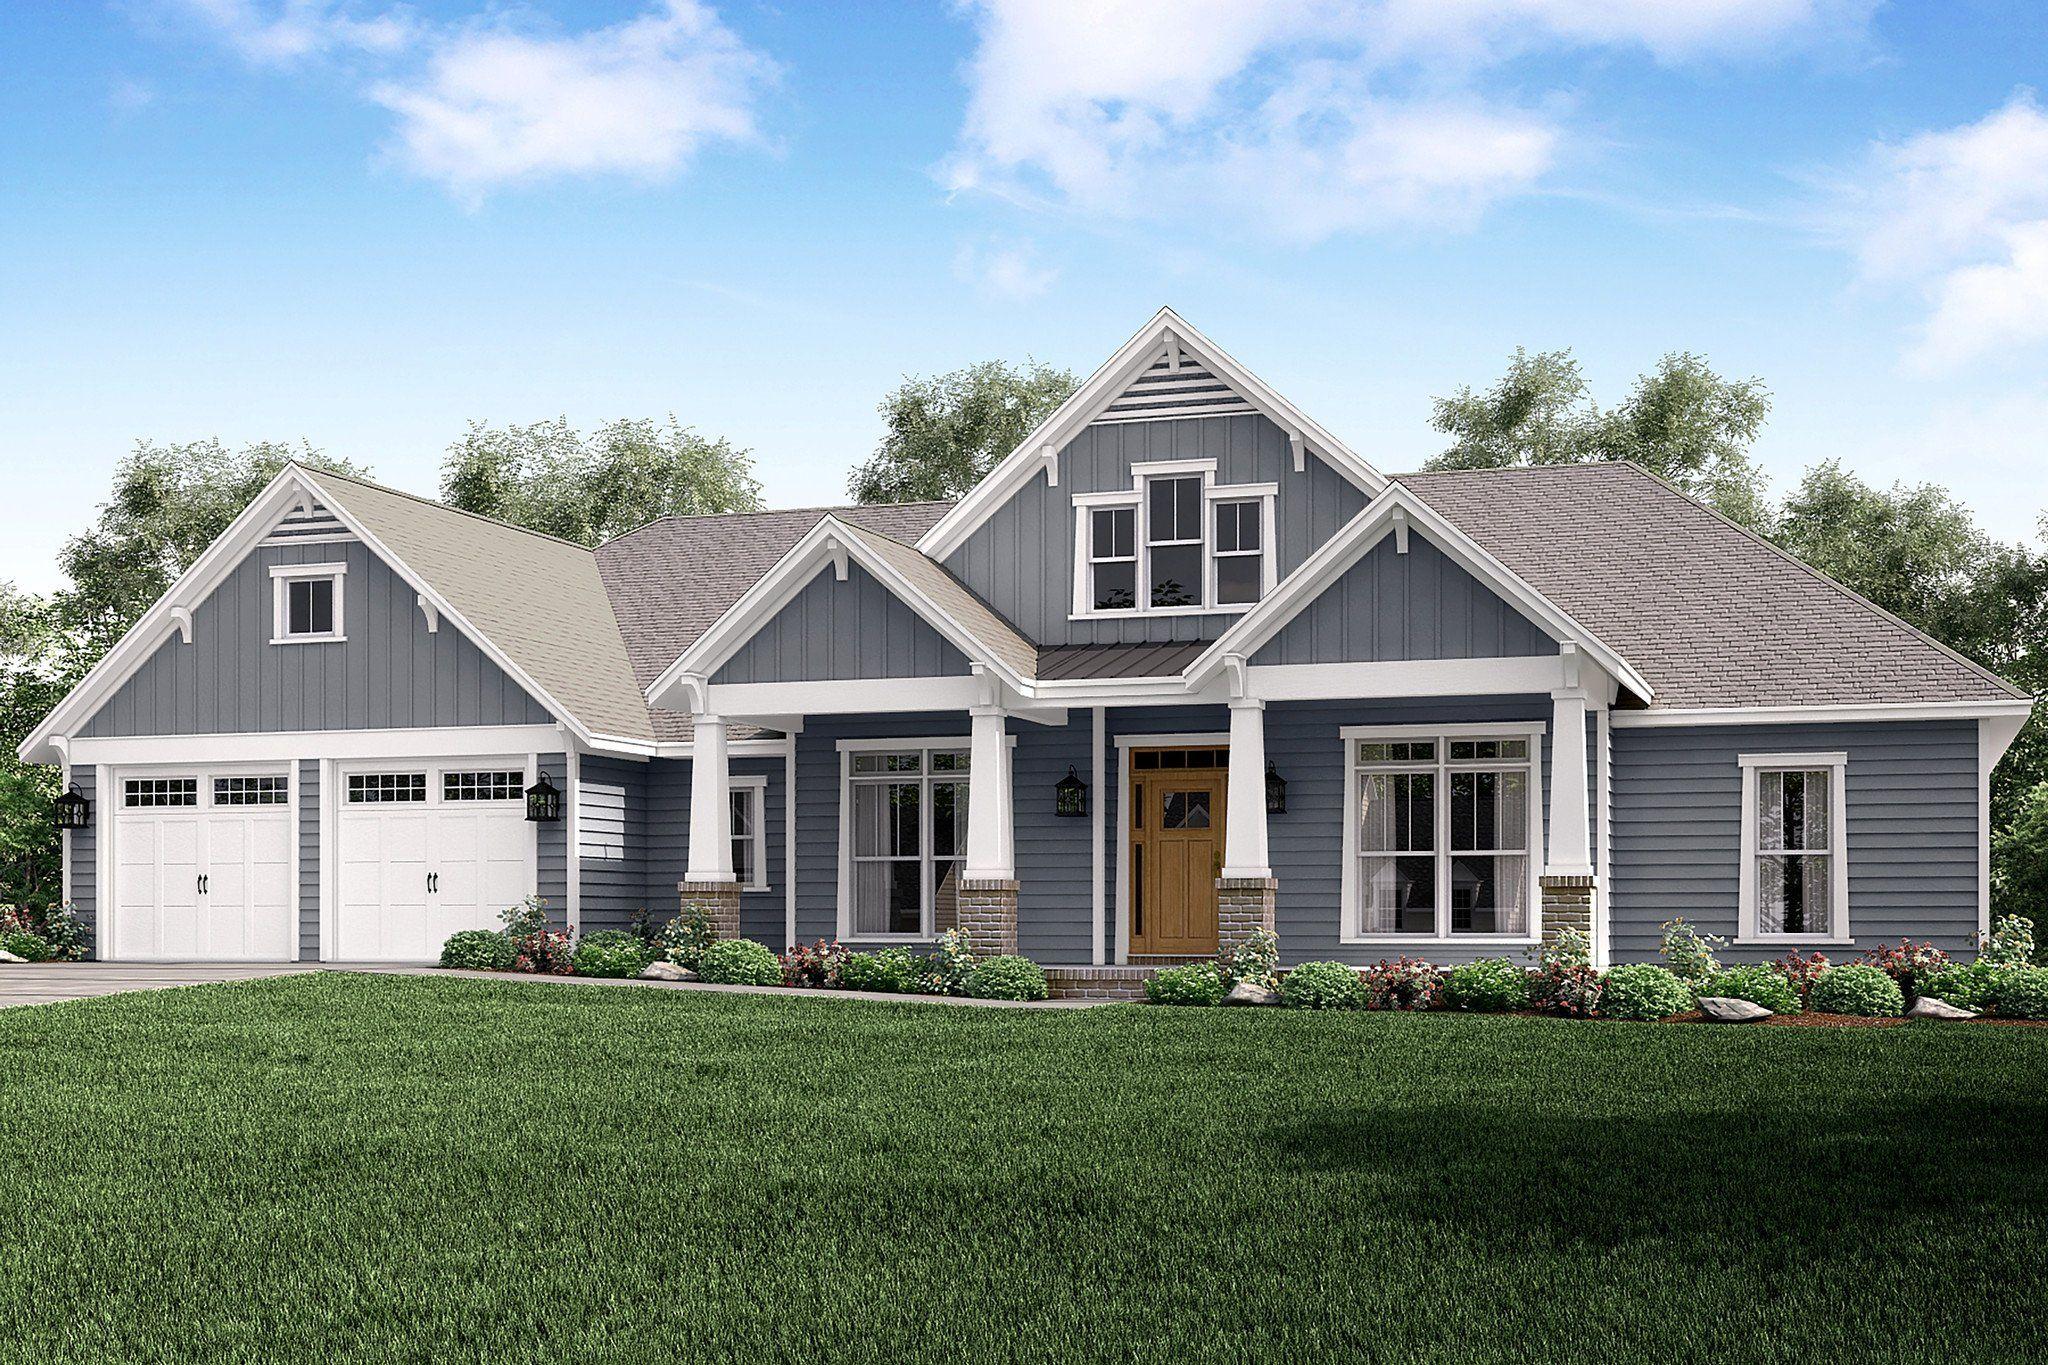 Frontier Lane House Plan Craftsman FarmhouseCraftsman Style